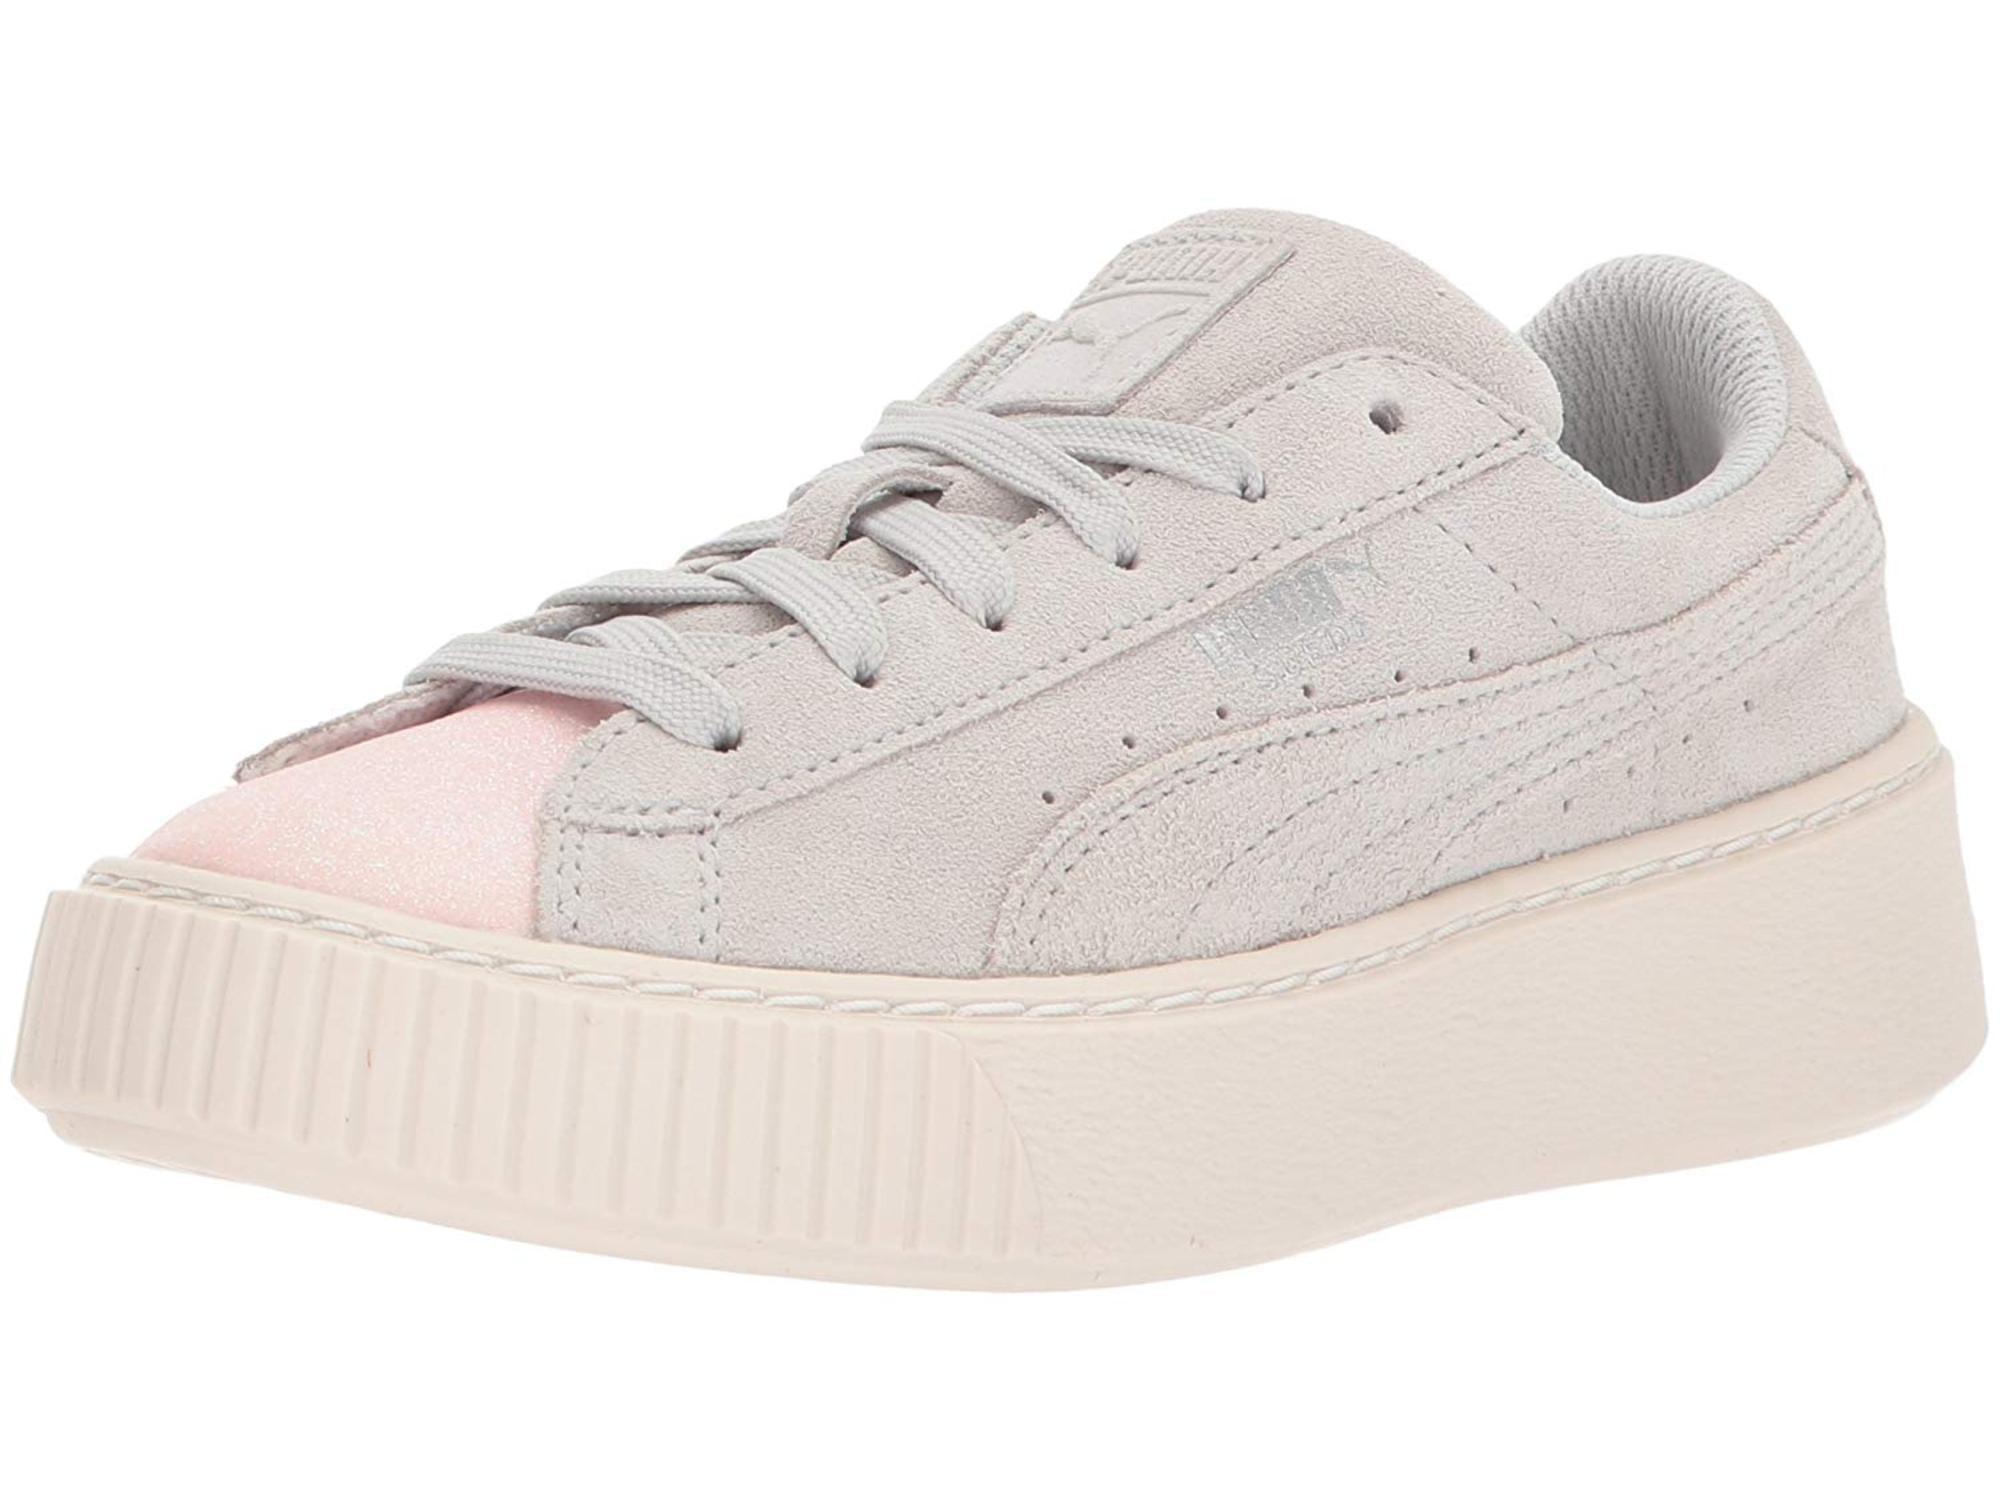 sports shoes 41828 fb6c9 Puma Kids' Suede Platform Glam Sneaker